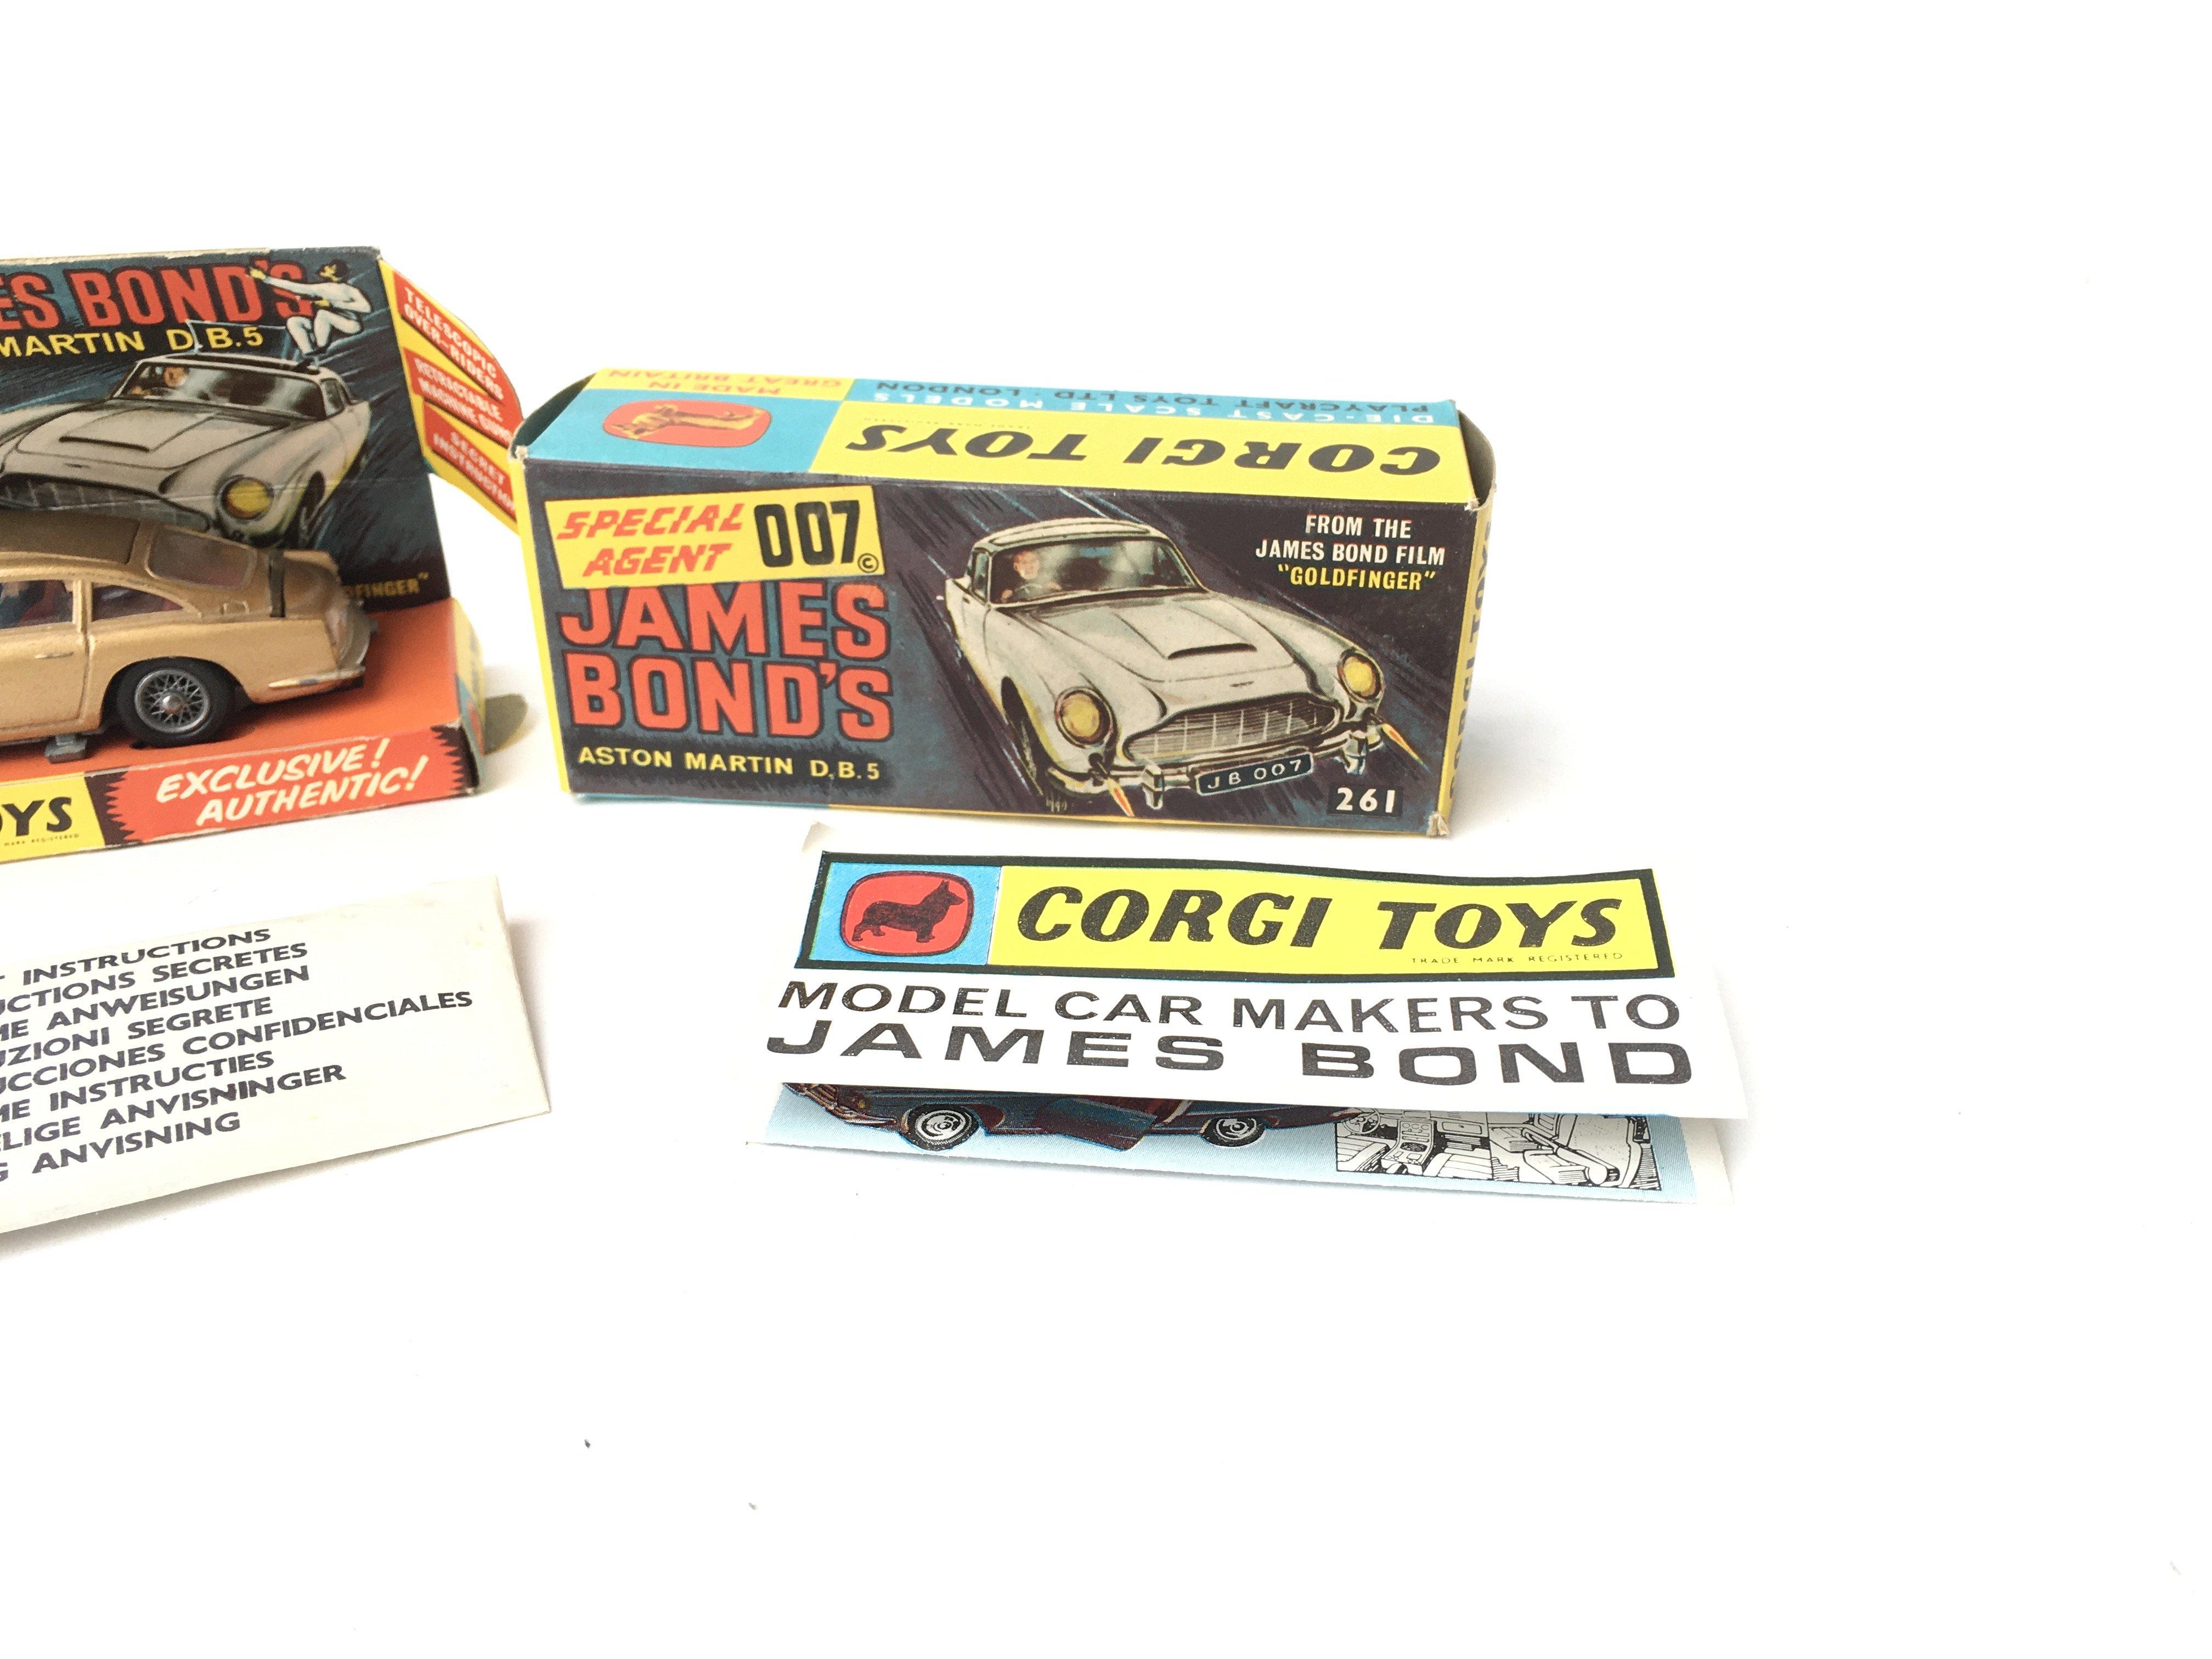 A Boxed Corgi James Bond Aston Martin D.B.5 #261. - Image 3 of 5